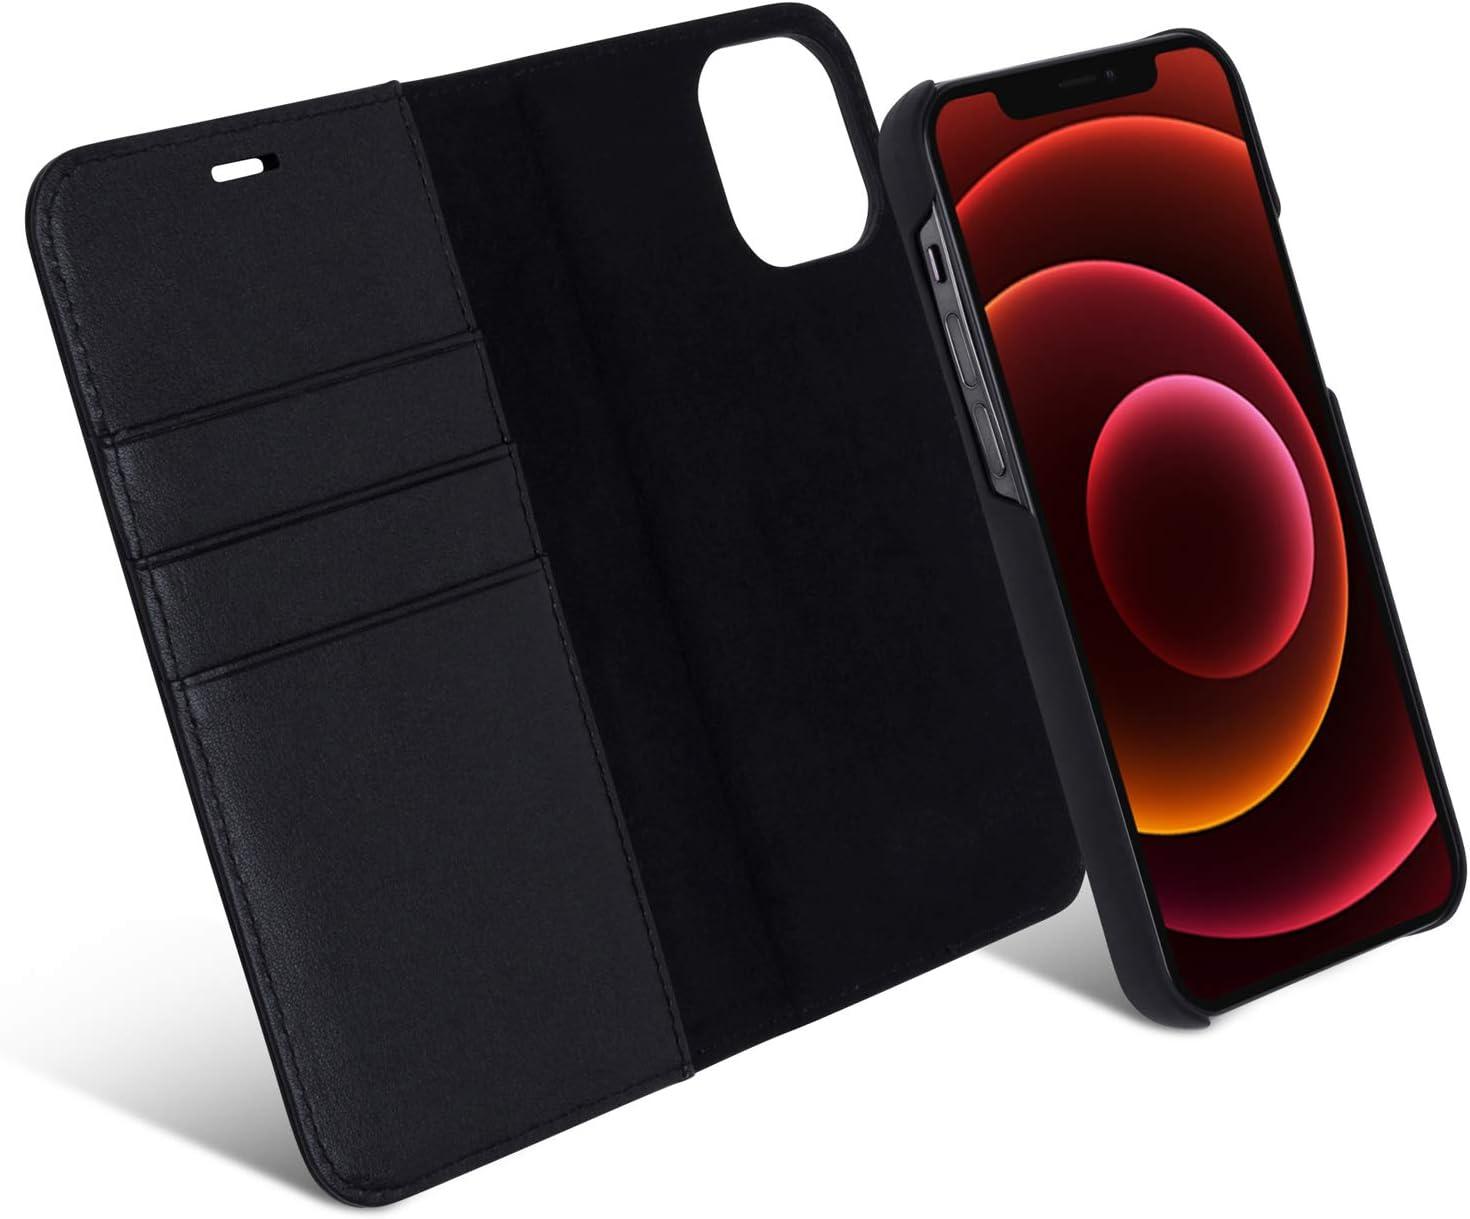 Iphone 12 Hülle Iphone 12 Pro Case Kunstleder 2 In 1 Elektronik